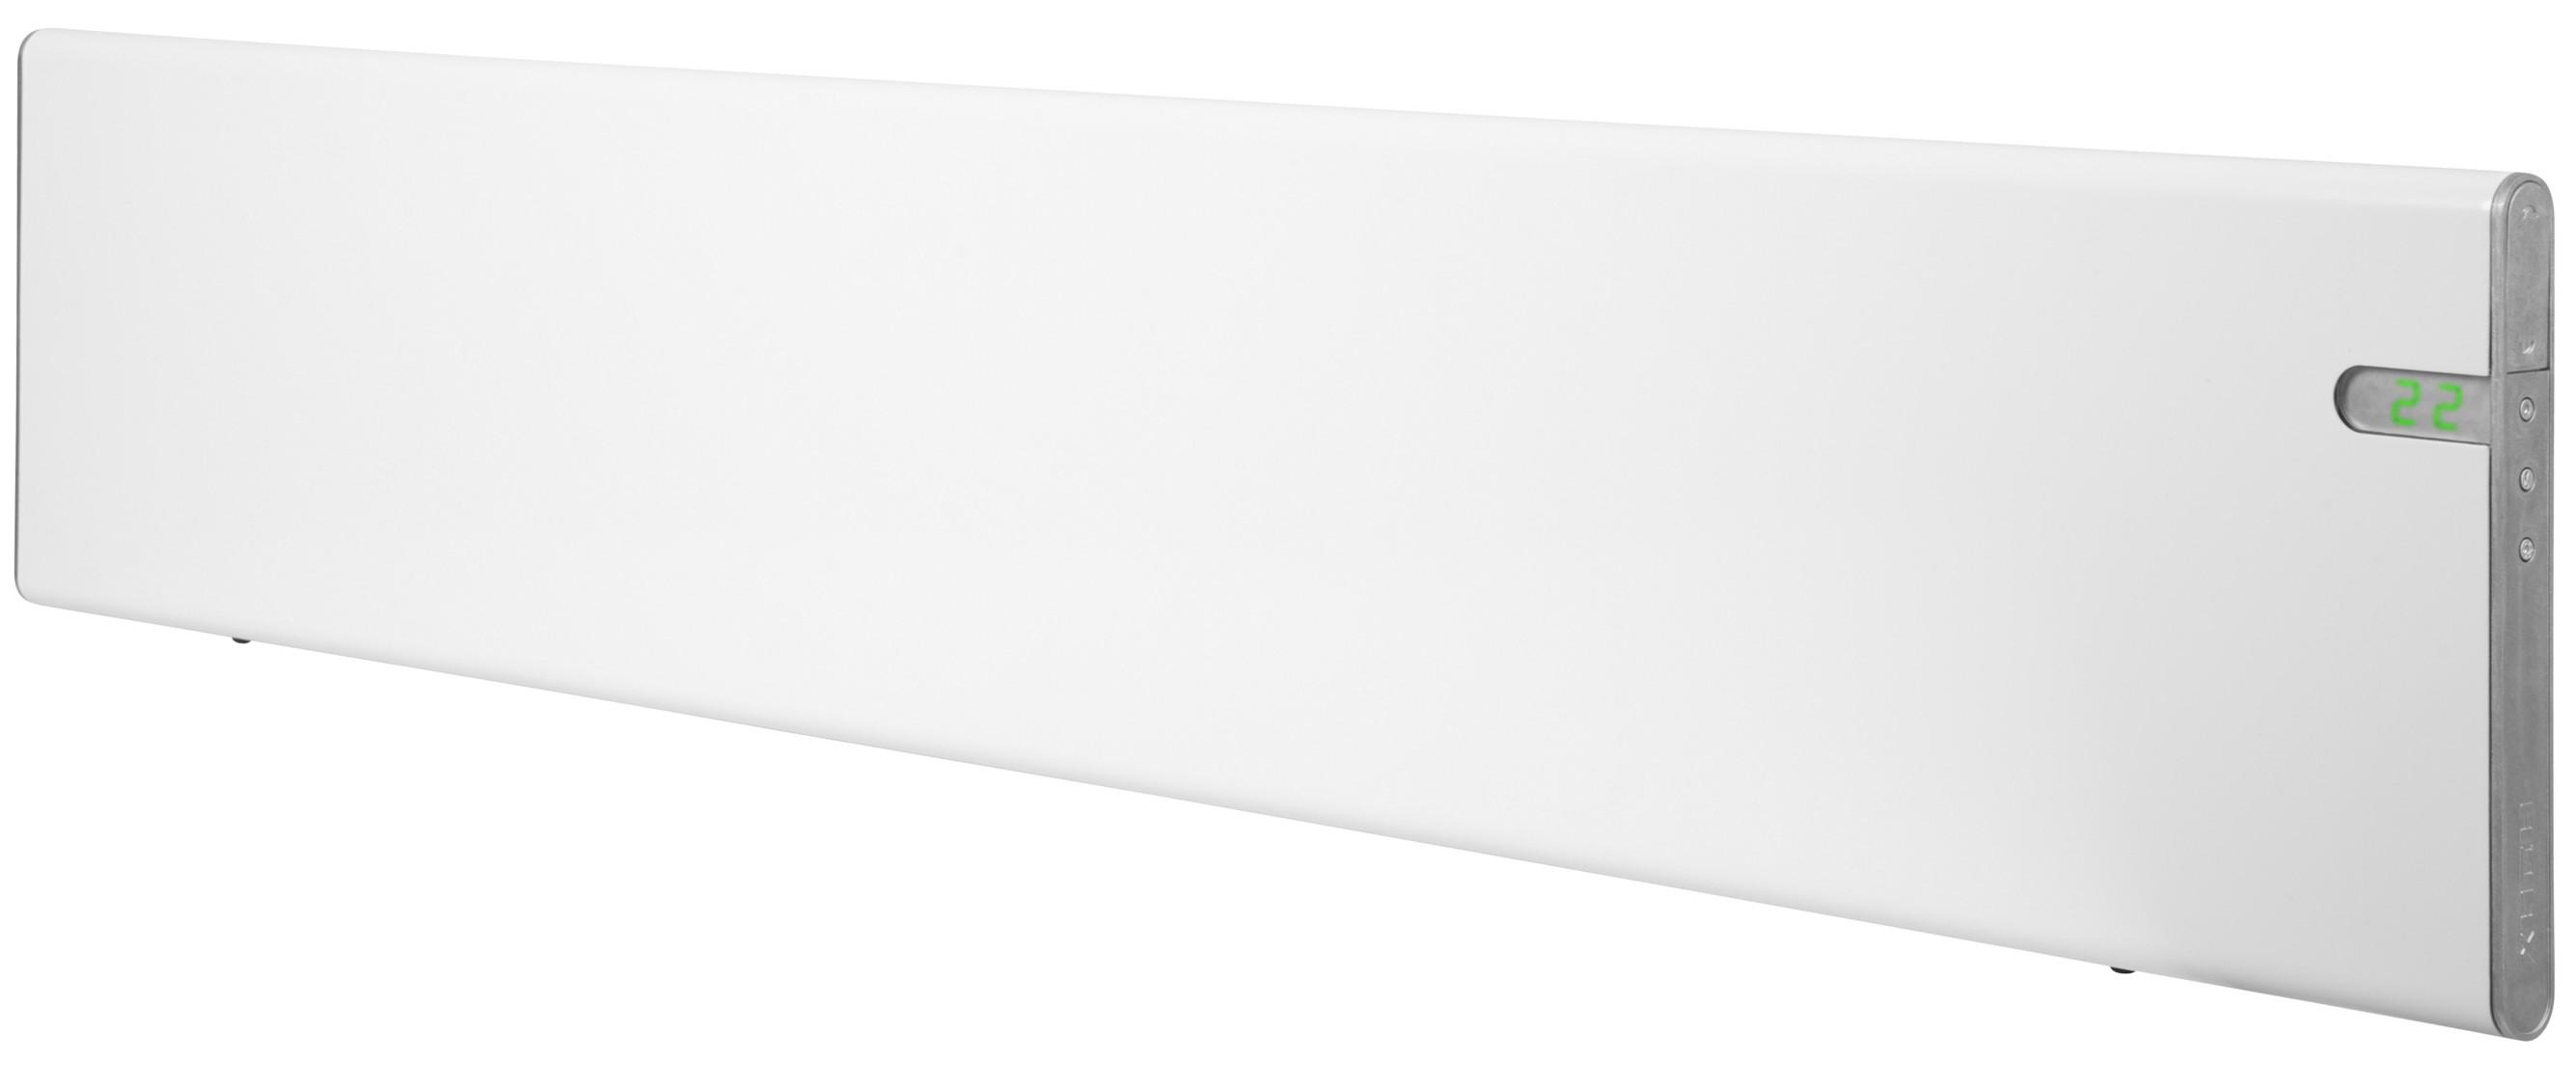 NL212KDTWHITE : Adax Neo 2 panelovn NL 212 KDT (hvit)